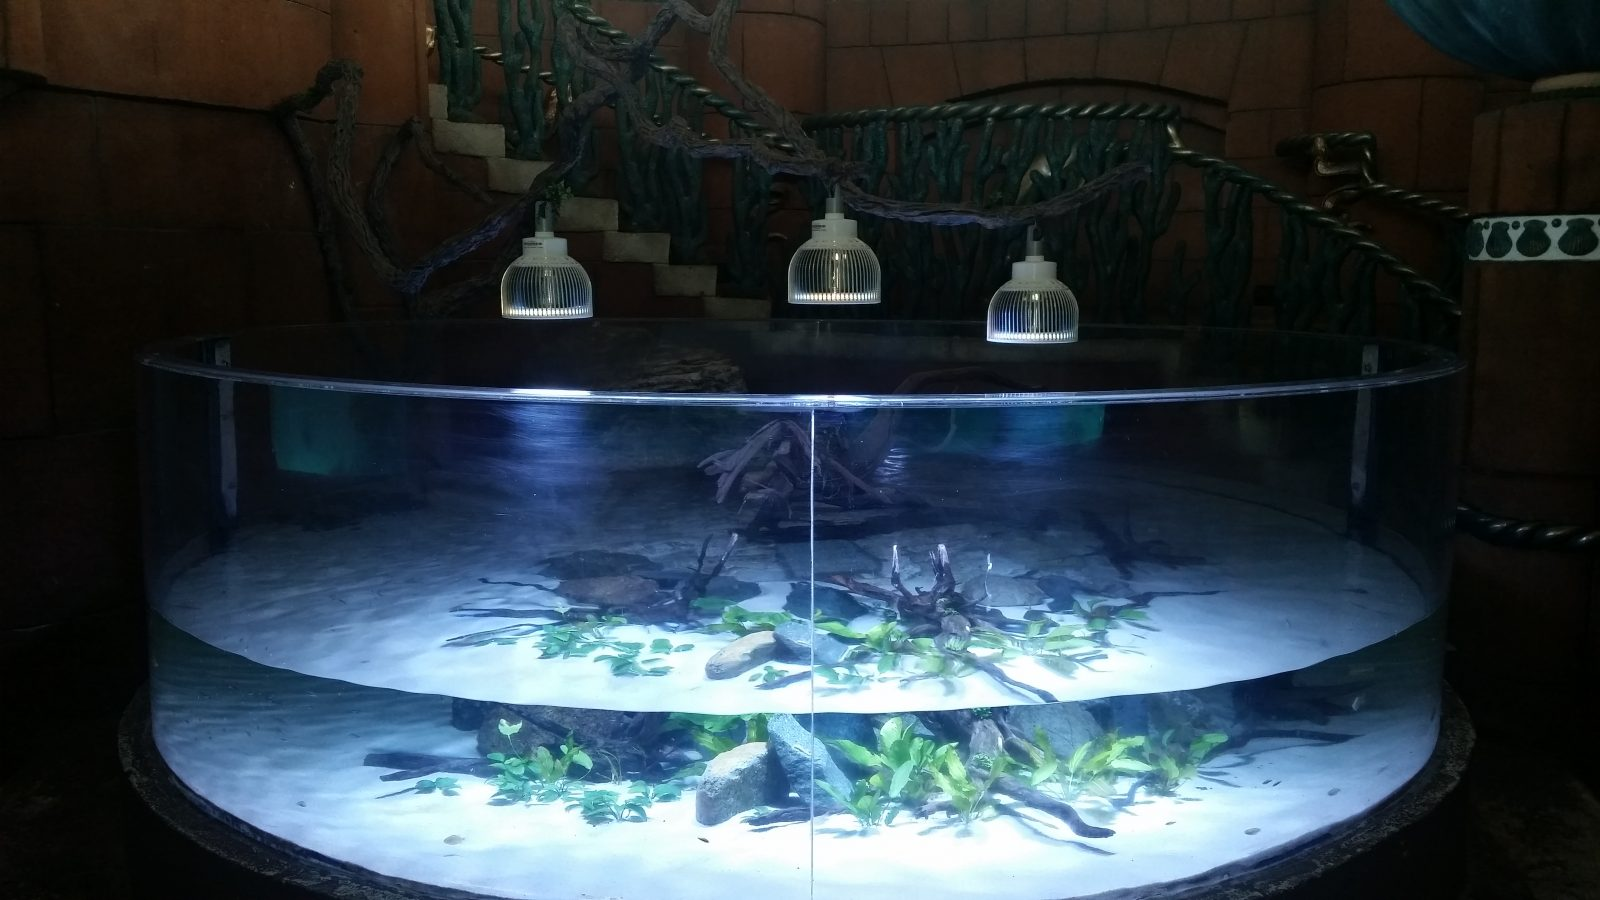 bermuda-hotel-Aquarium-LED-orphek